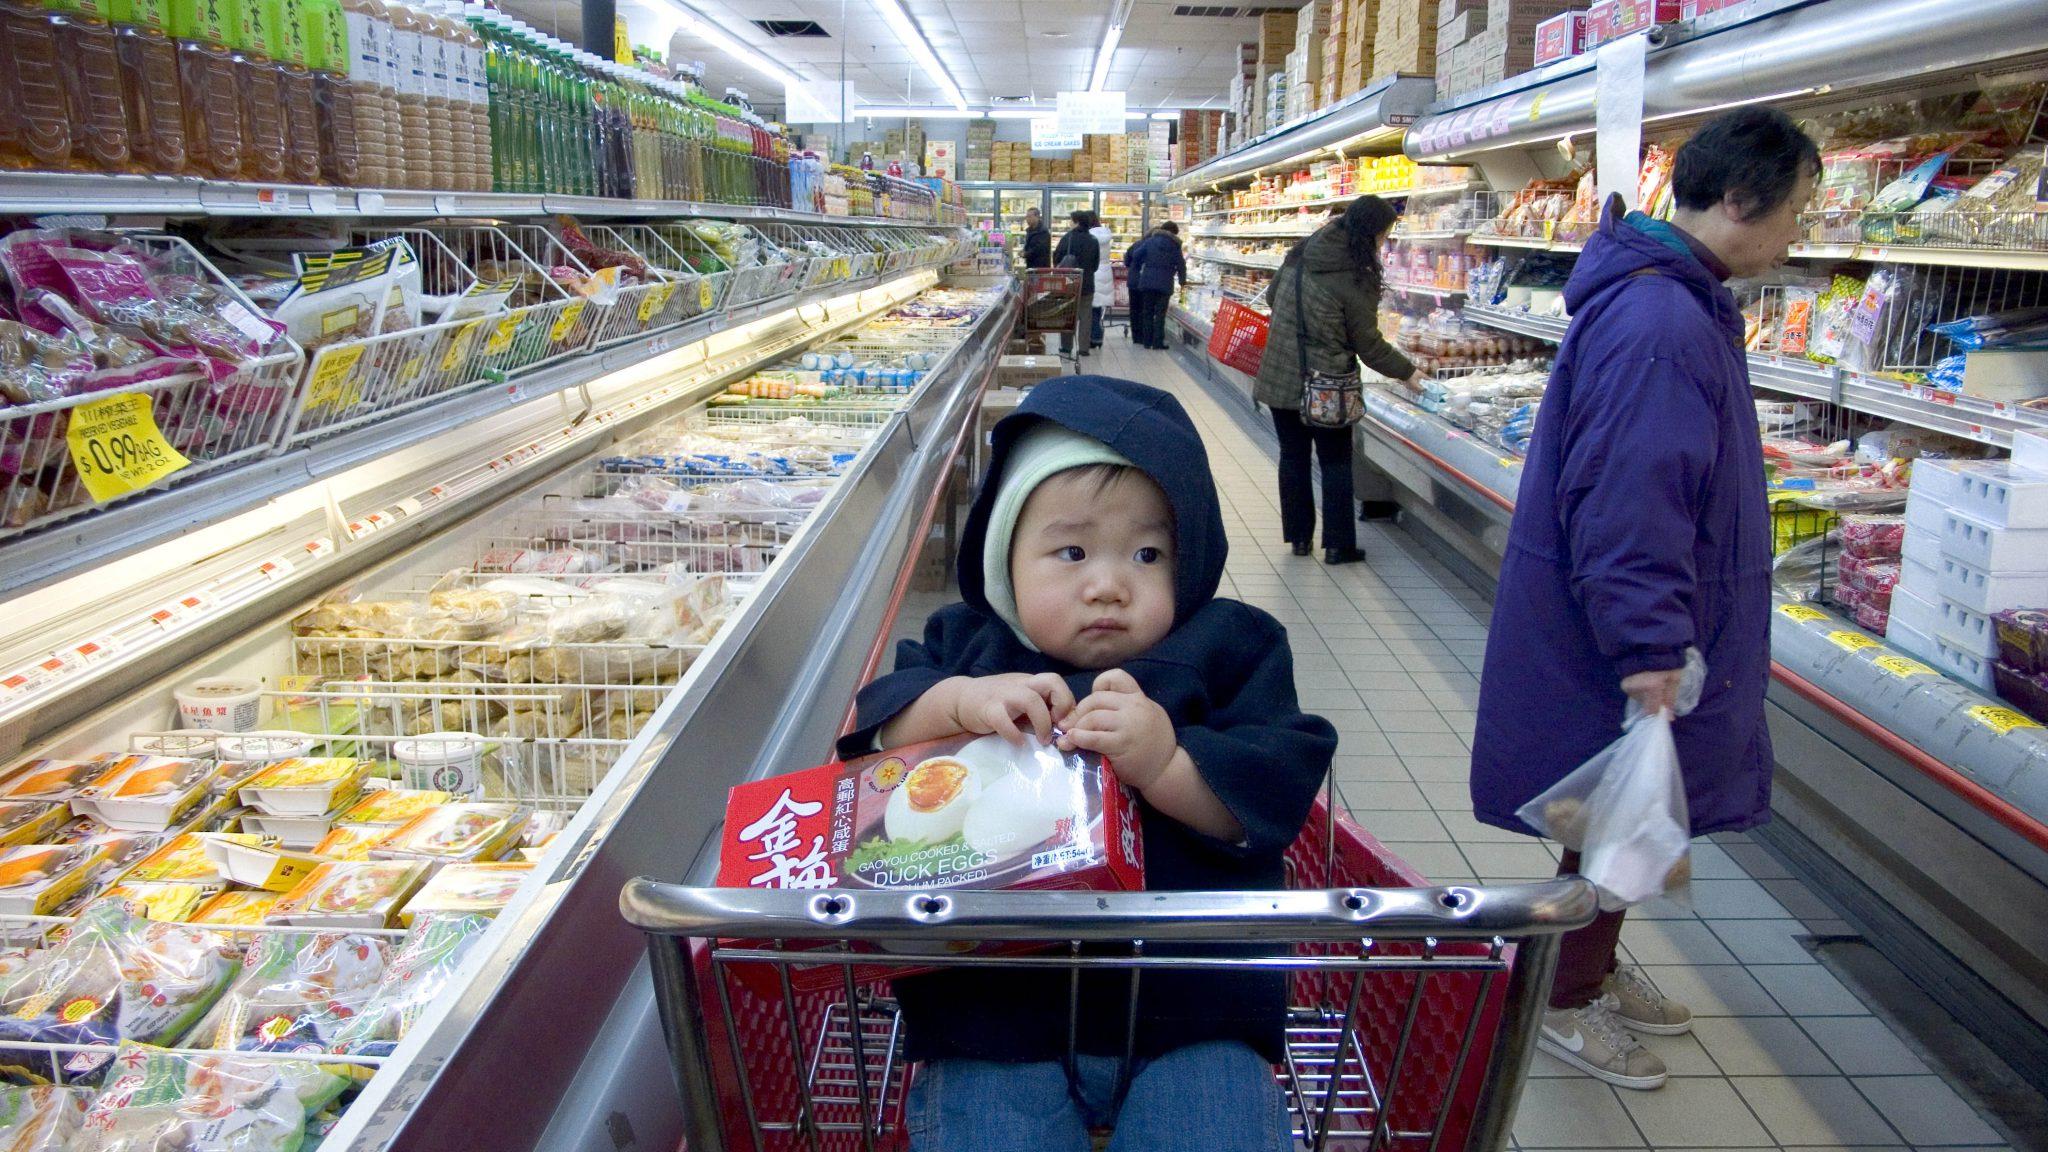 Baby in supermarket trolley